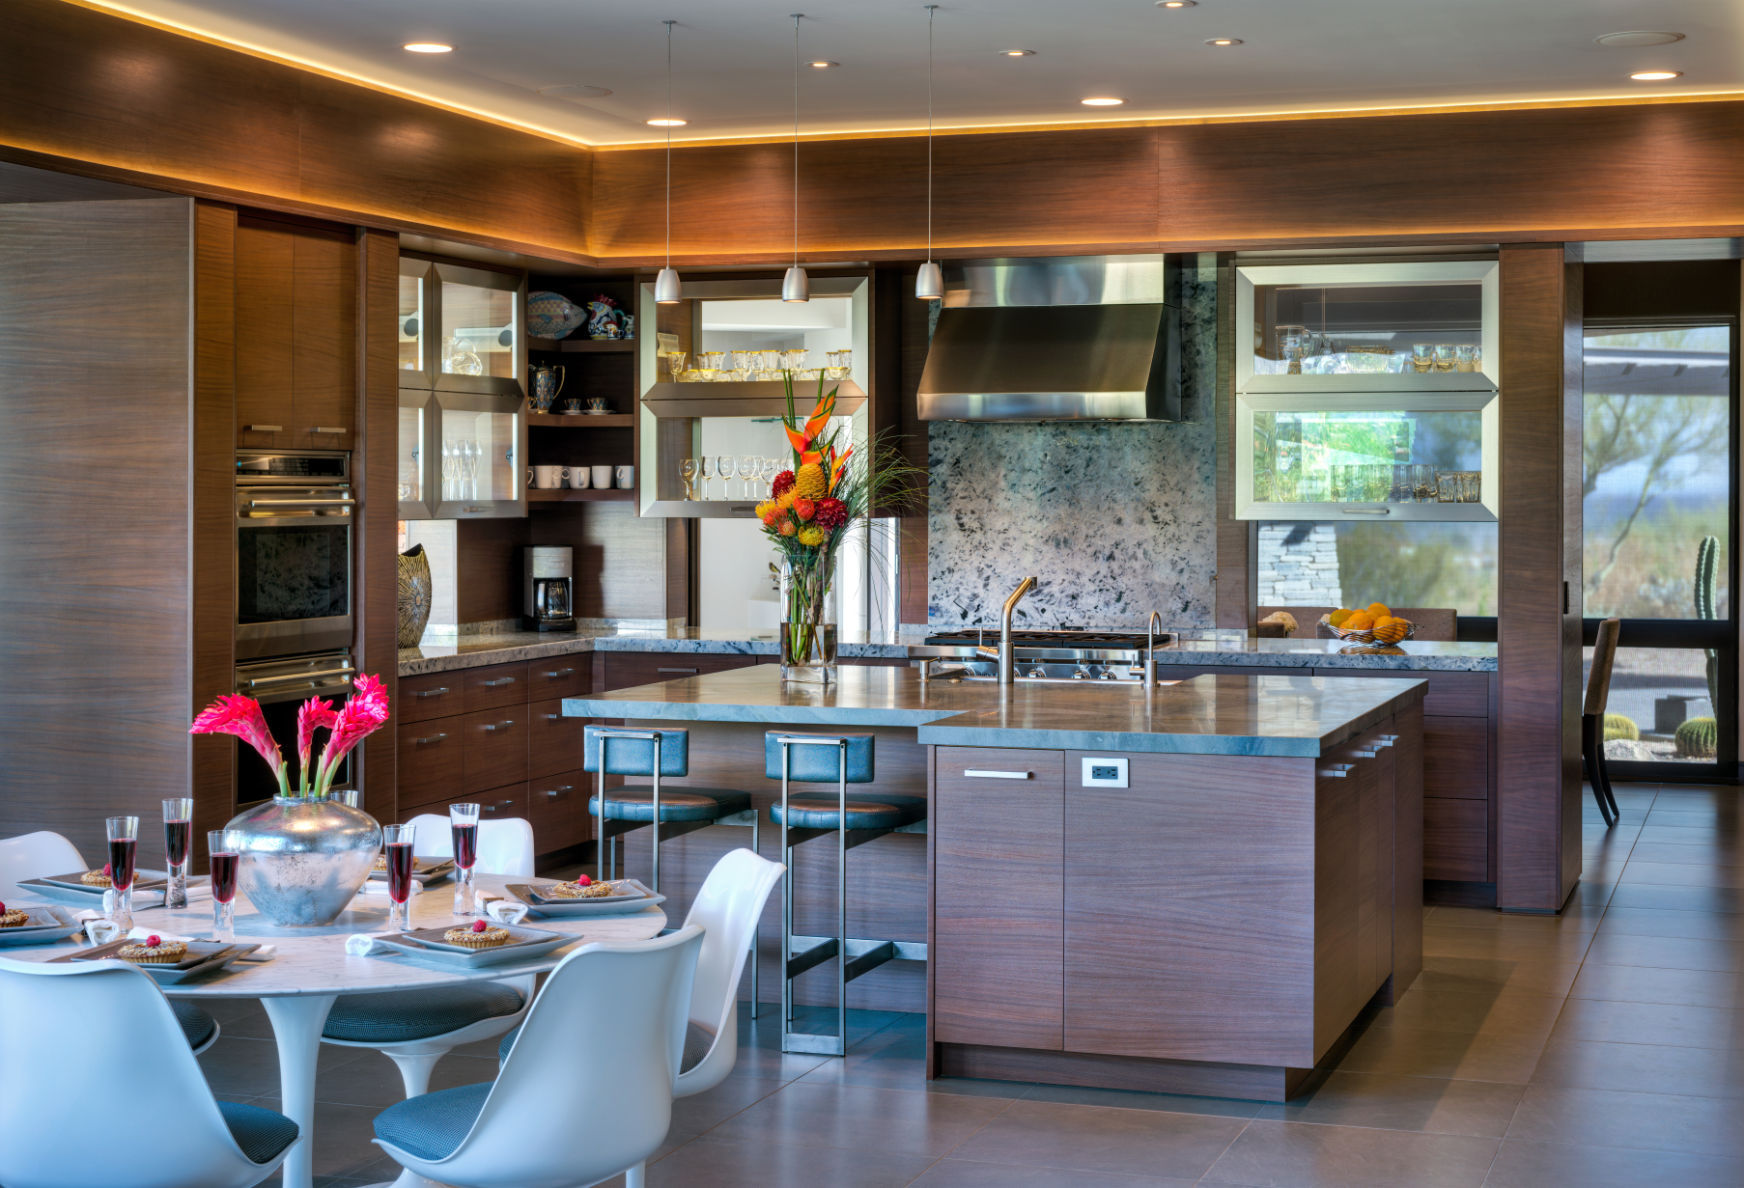 Marvelous Tucson Design Team Wins National Kitchen Award